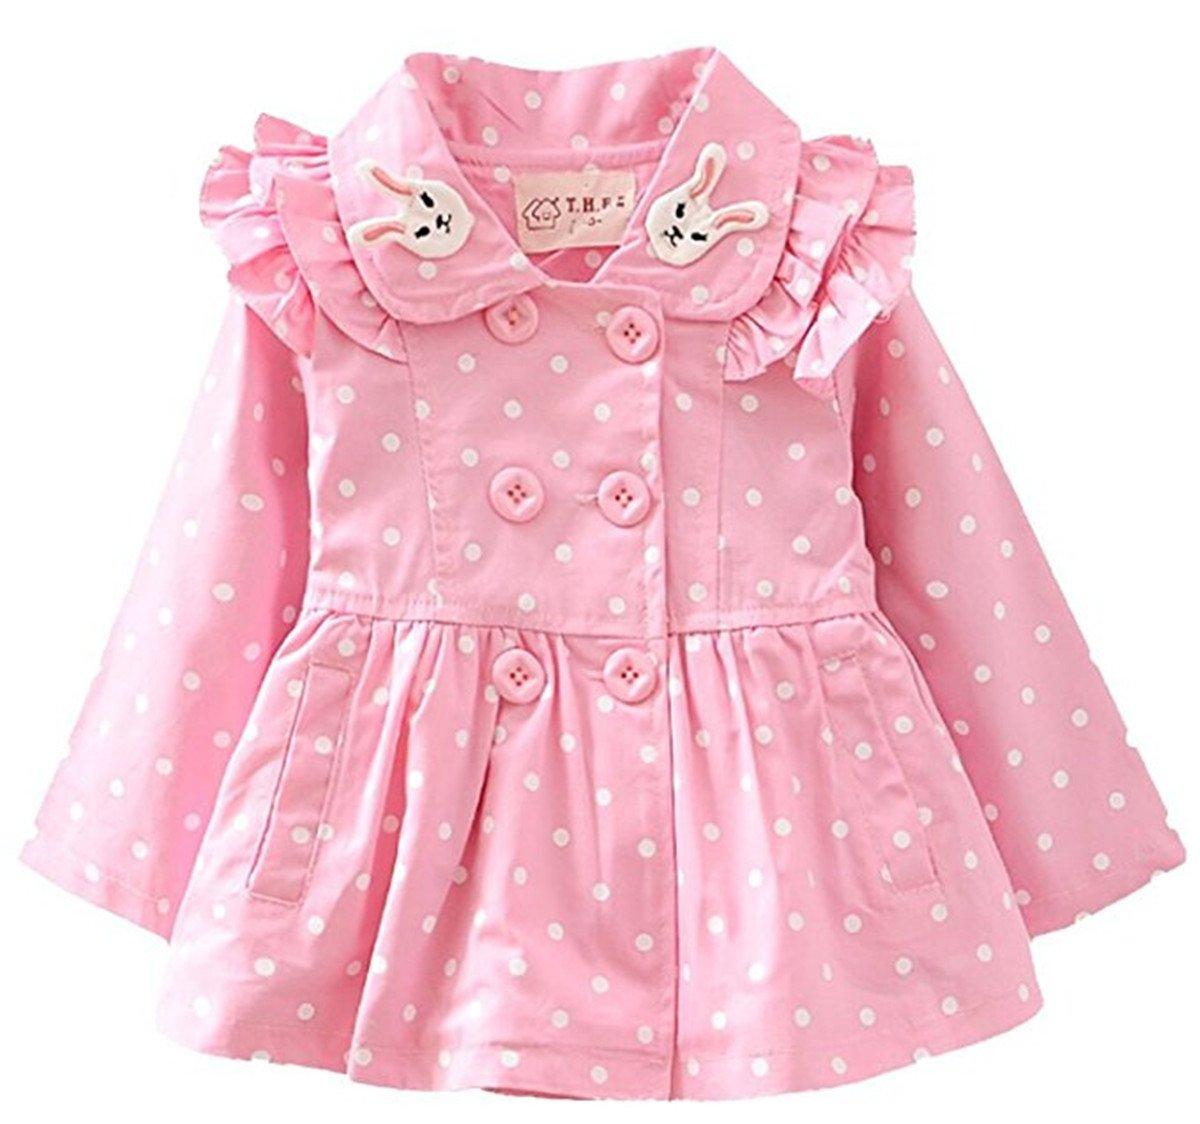 FAIRYRAIN Baby Kid Little Girls Rabbit Polka Dot Hoodie Wind Proof Jacket Coat Outerwear